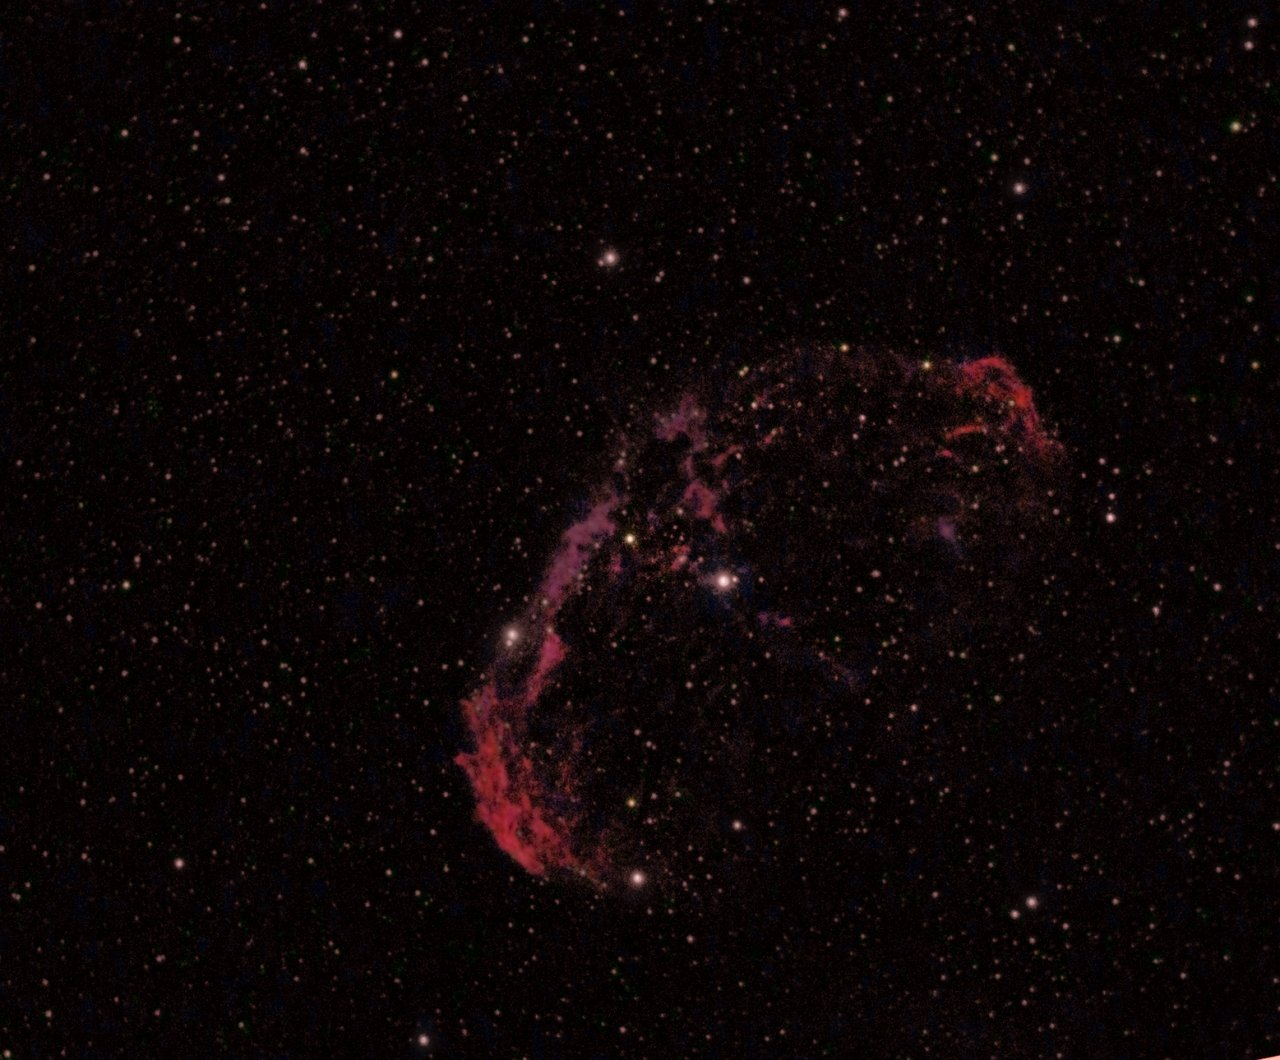 NGC6888, the Crescent Nebula